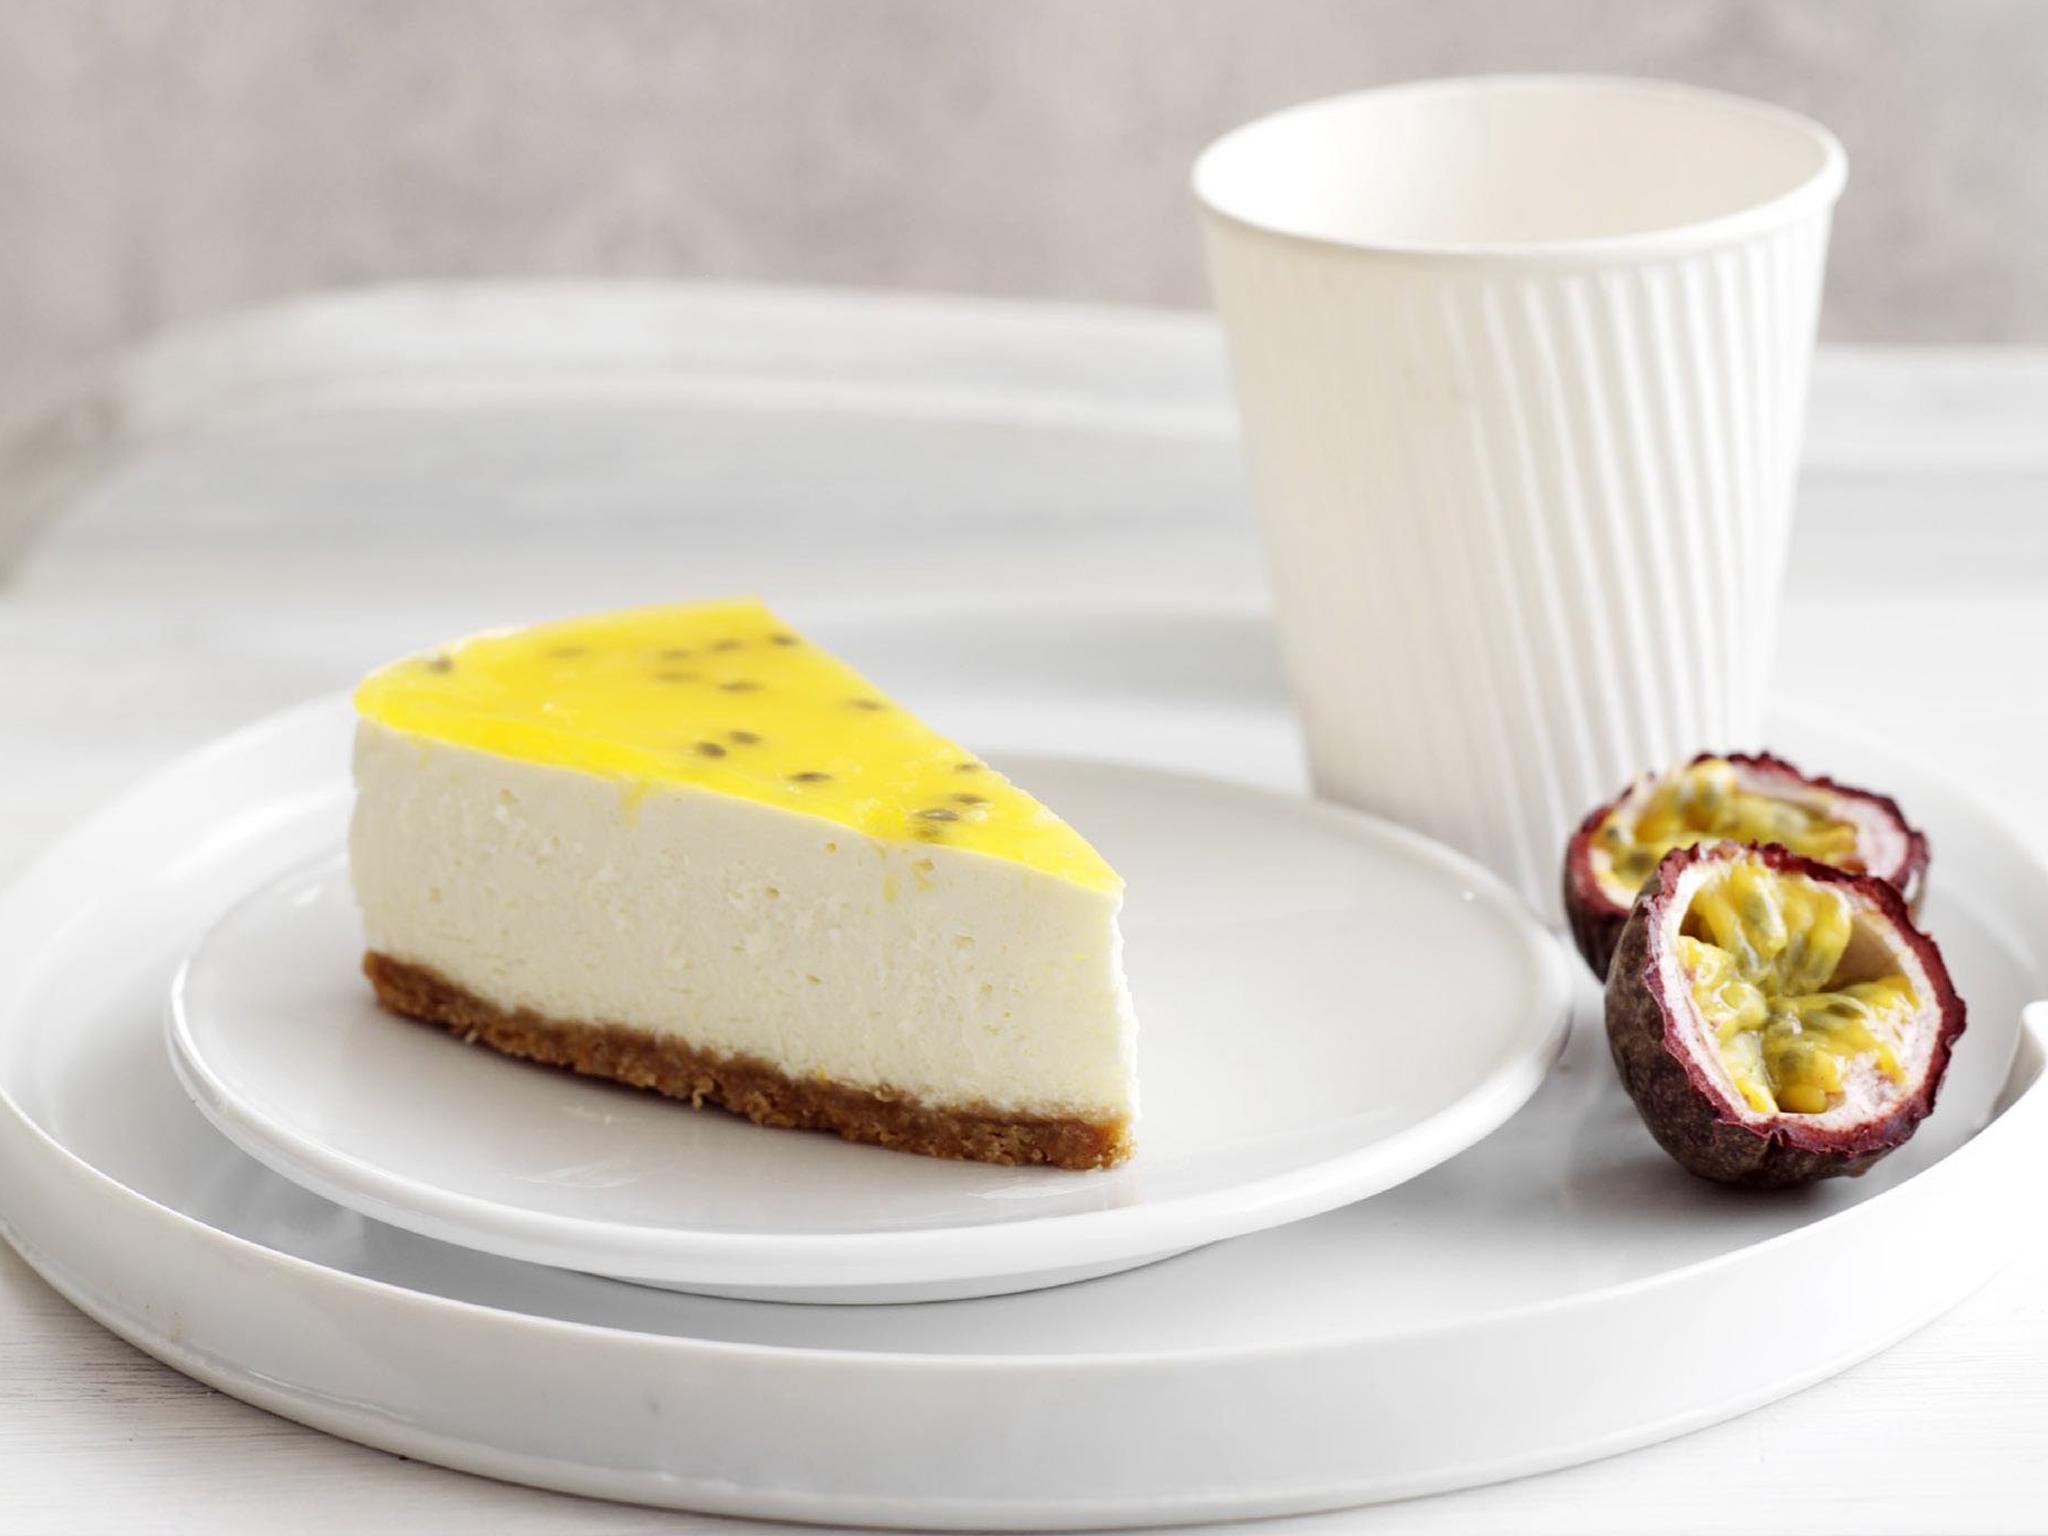 Lemon Ricotta Cheesecake forecasting